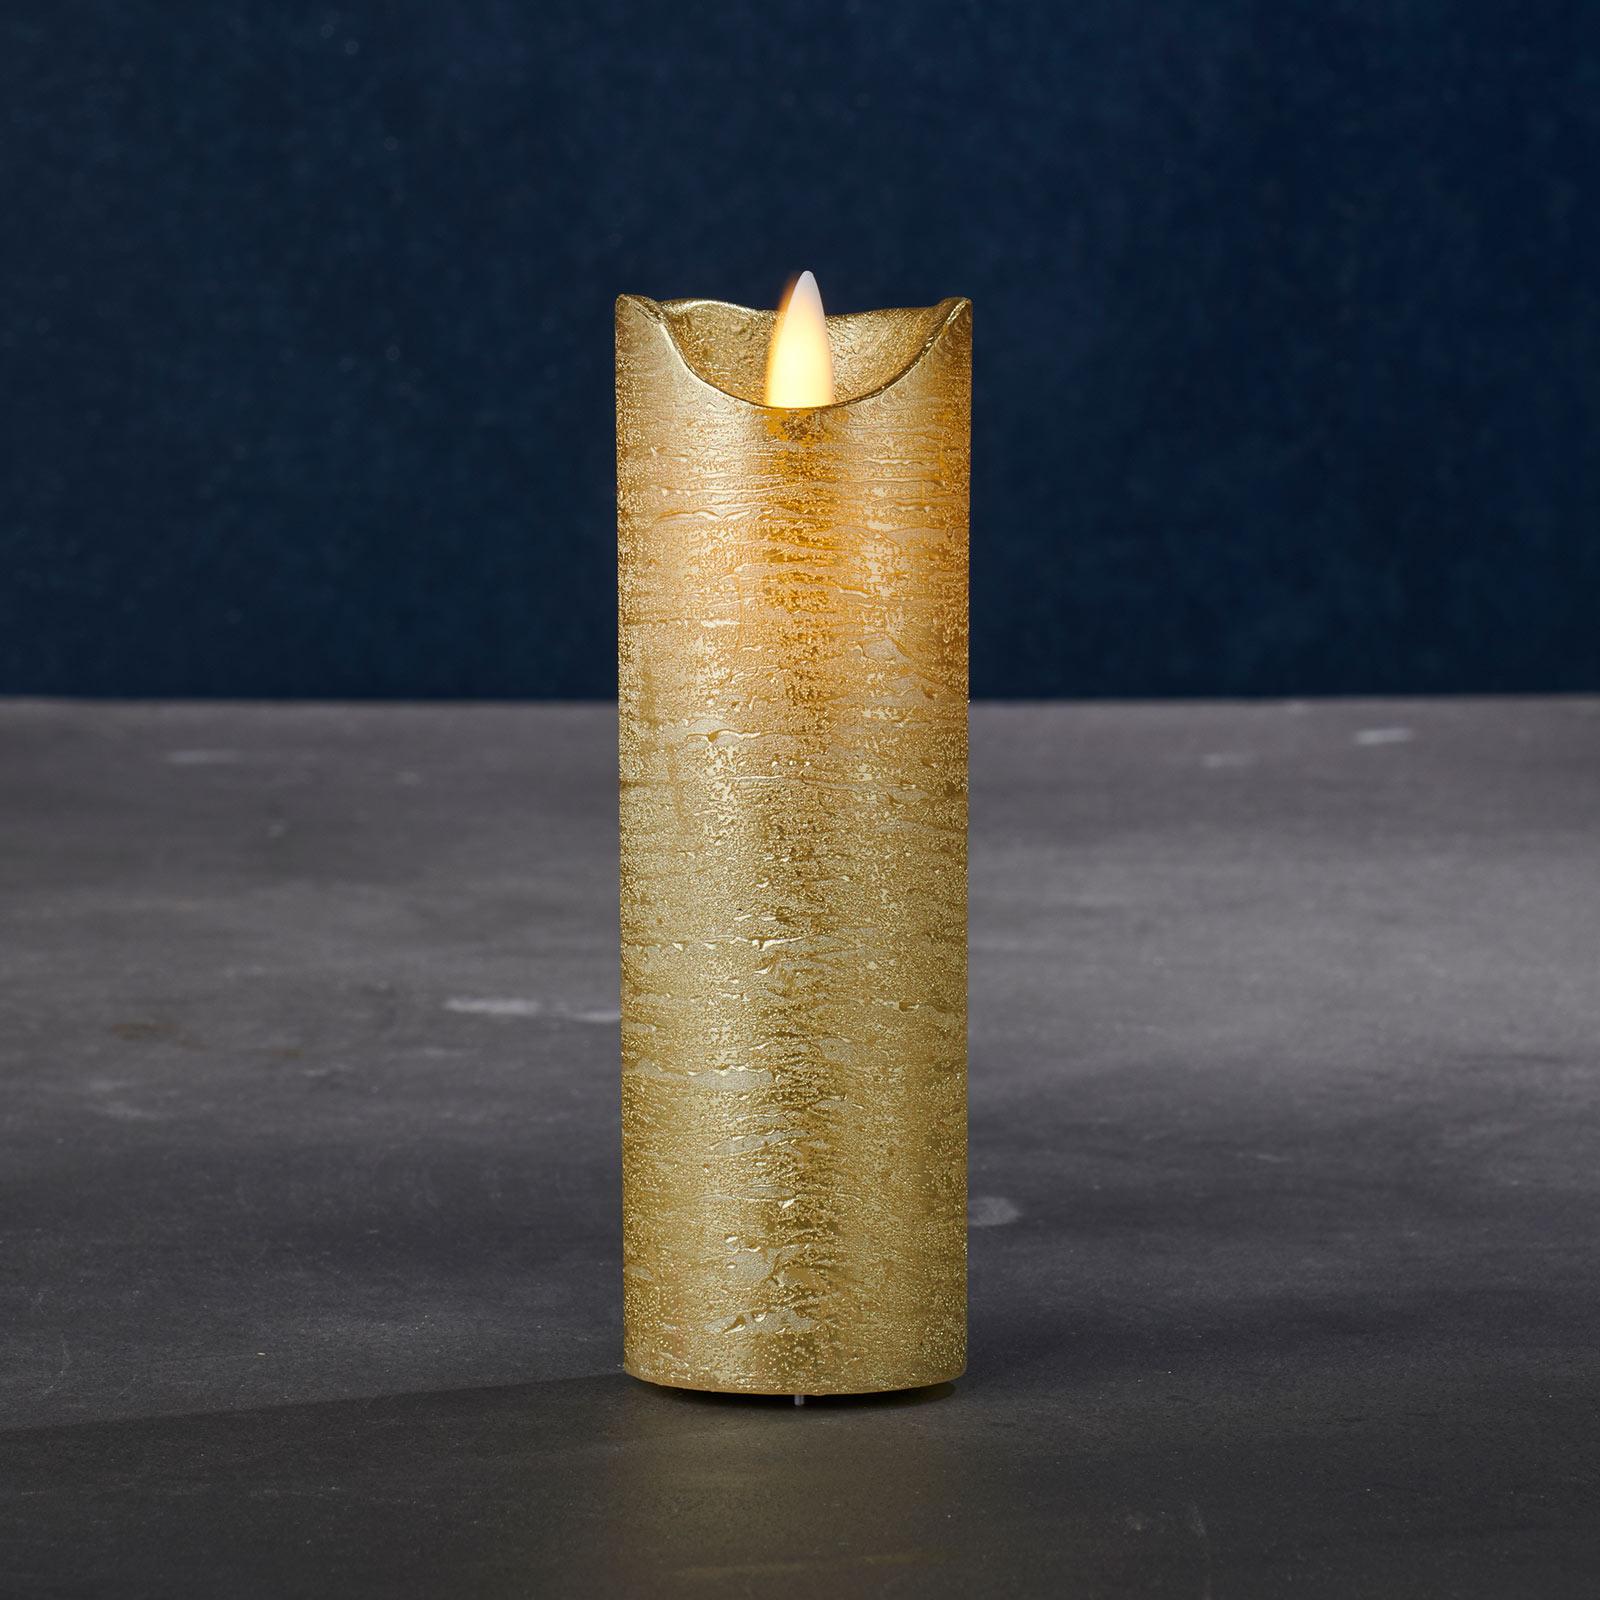 LED-Kerze Sara Exclusive, gold, Ø 5cm, Höhe 15cm